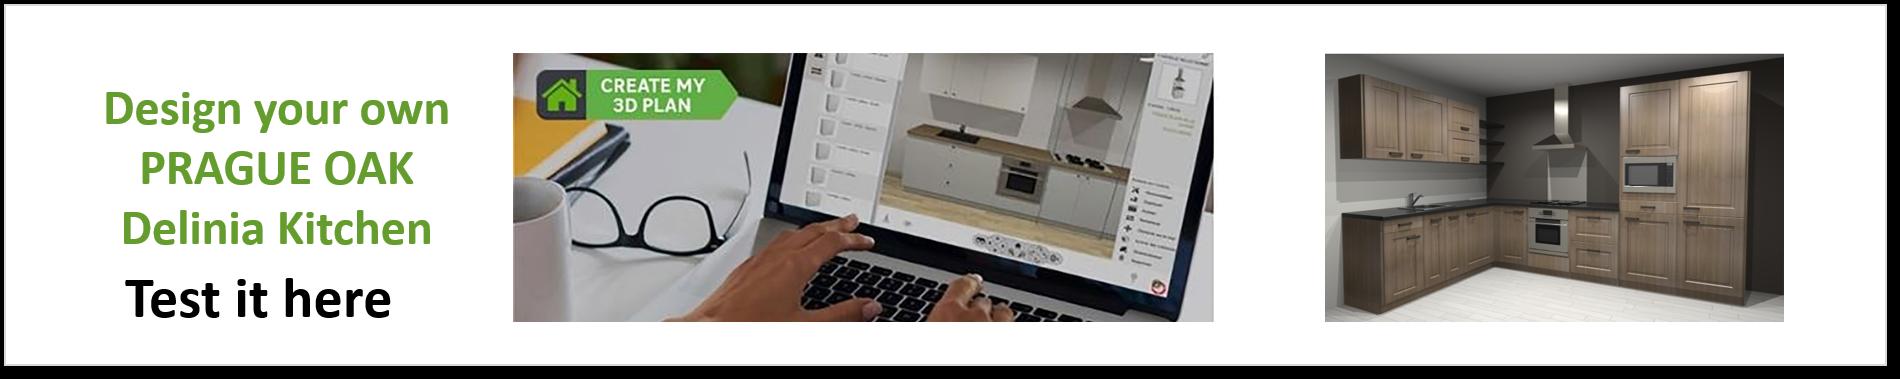 Create or Design your own Delinia Prague Designer Kitchen